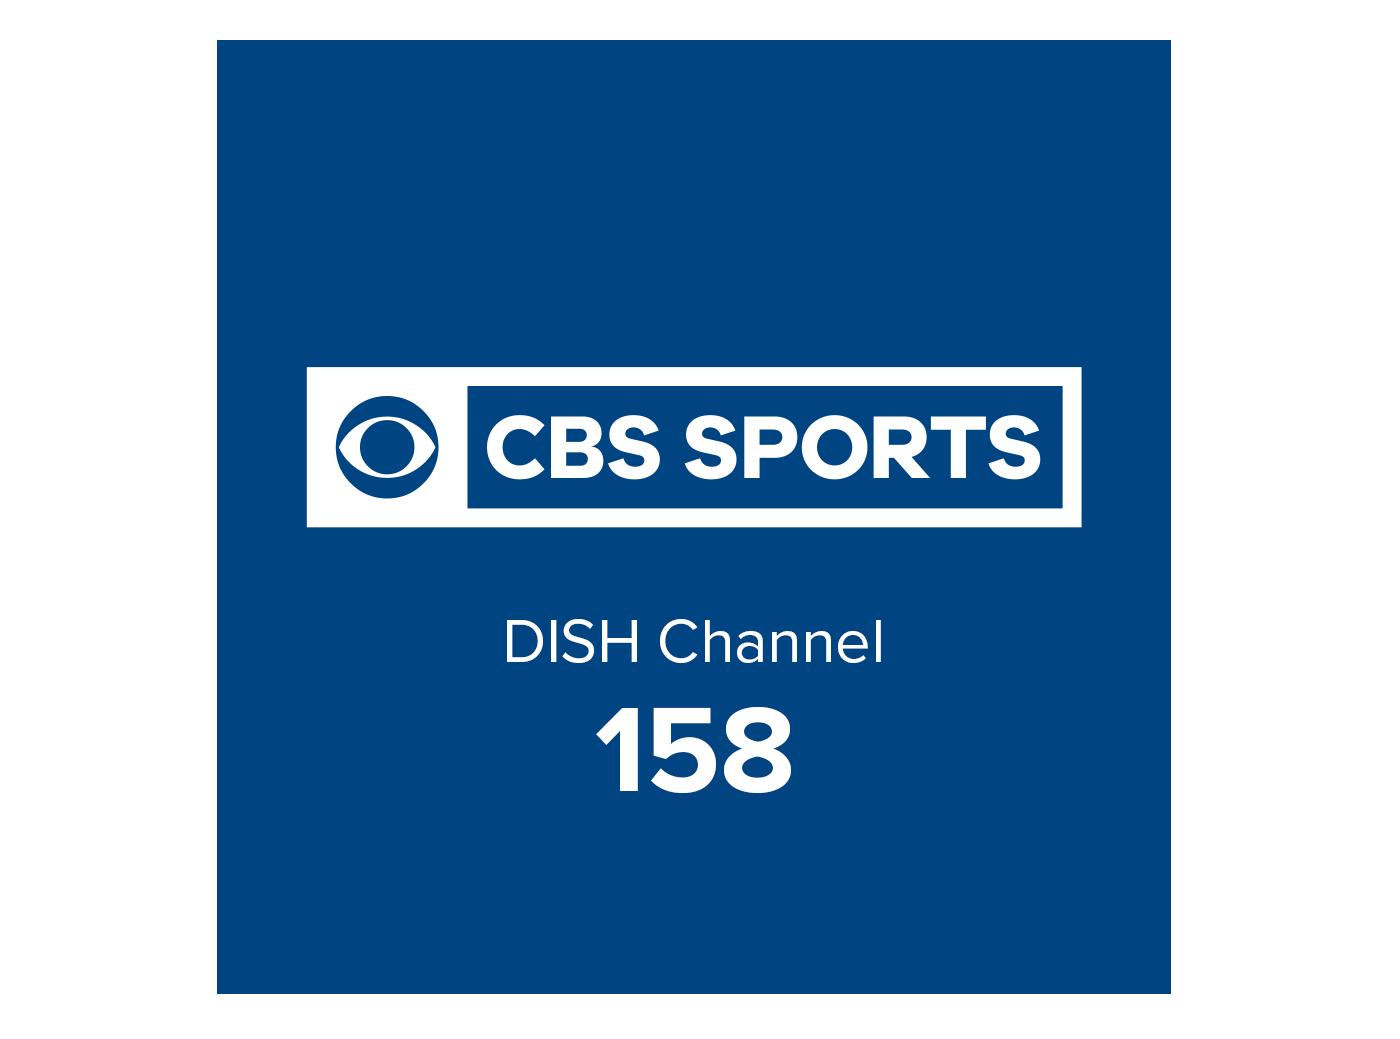 CBS sports channel 158